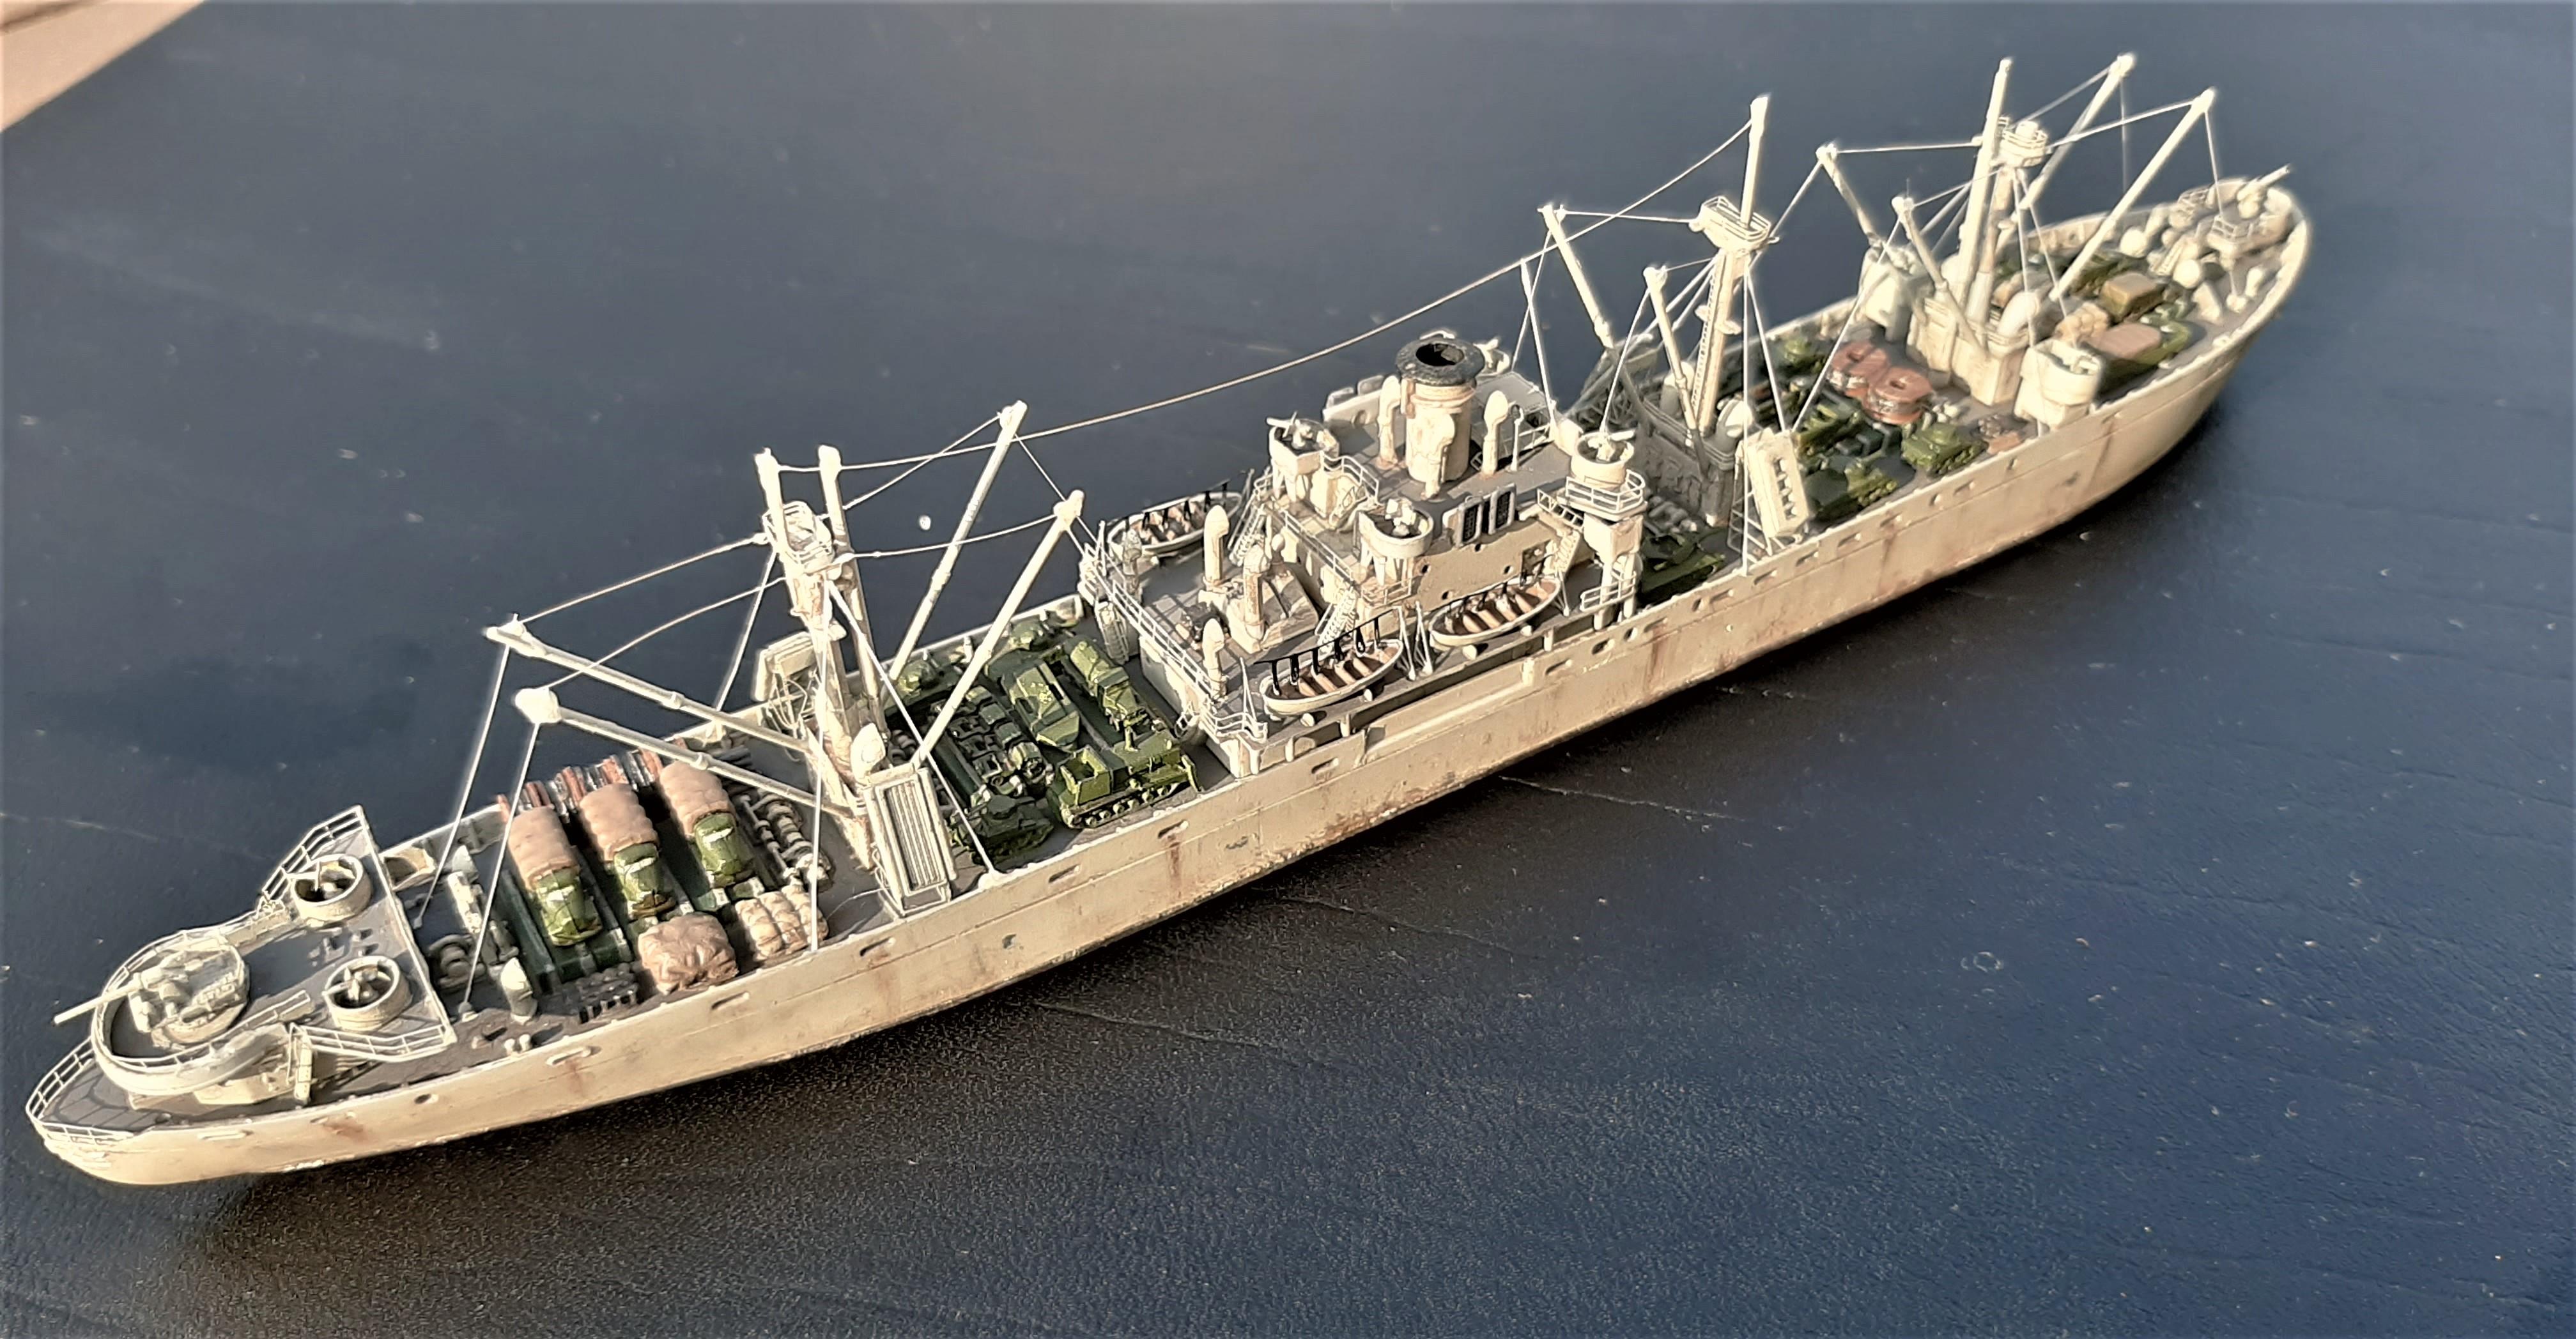 Liberty ship Jeremiah O'Brien 1/700 Trumpeter  ZIHyk1R